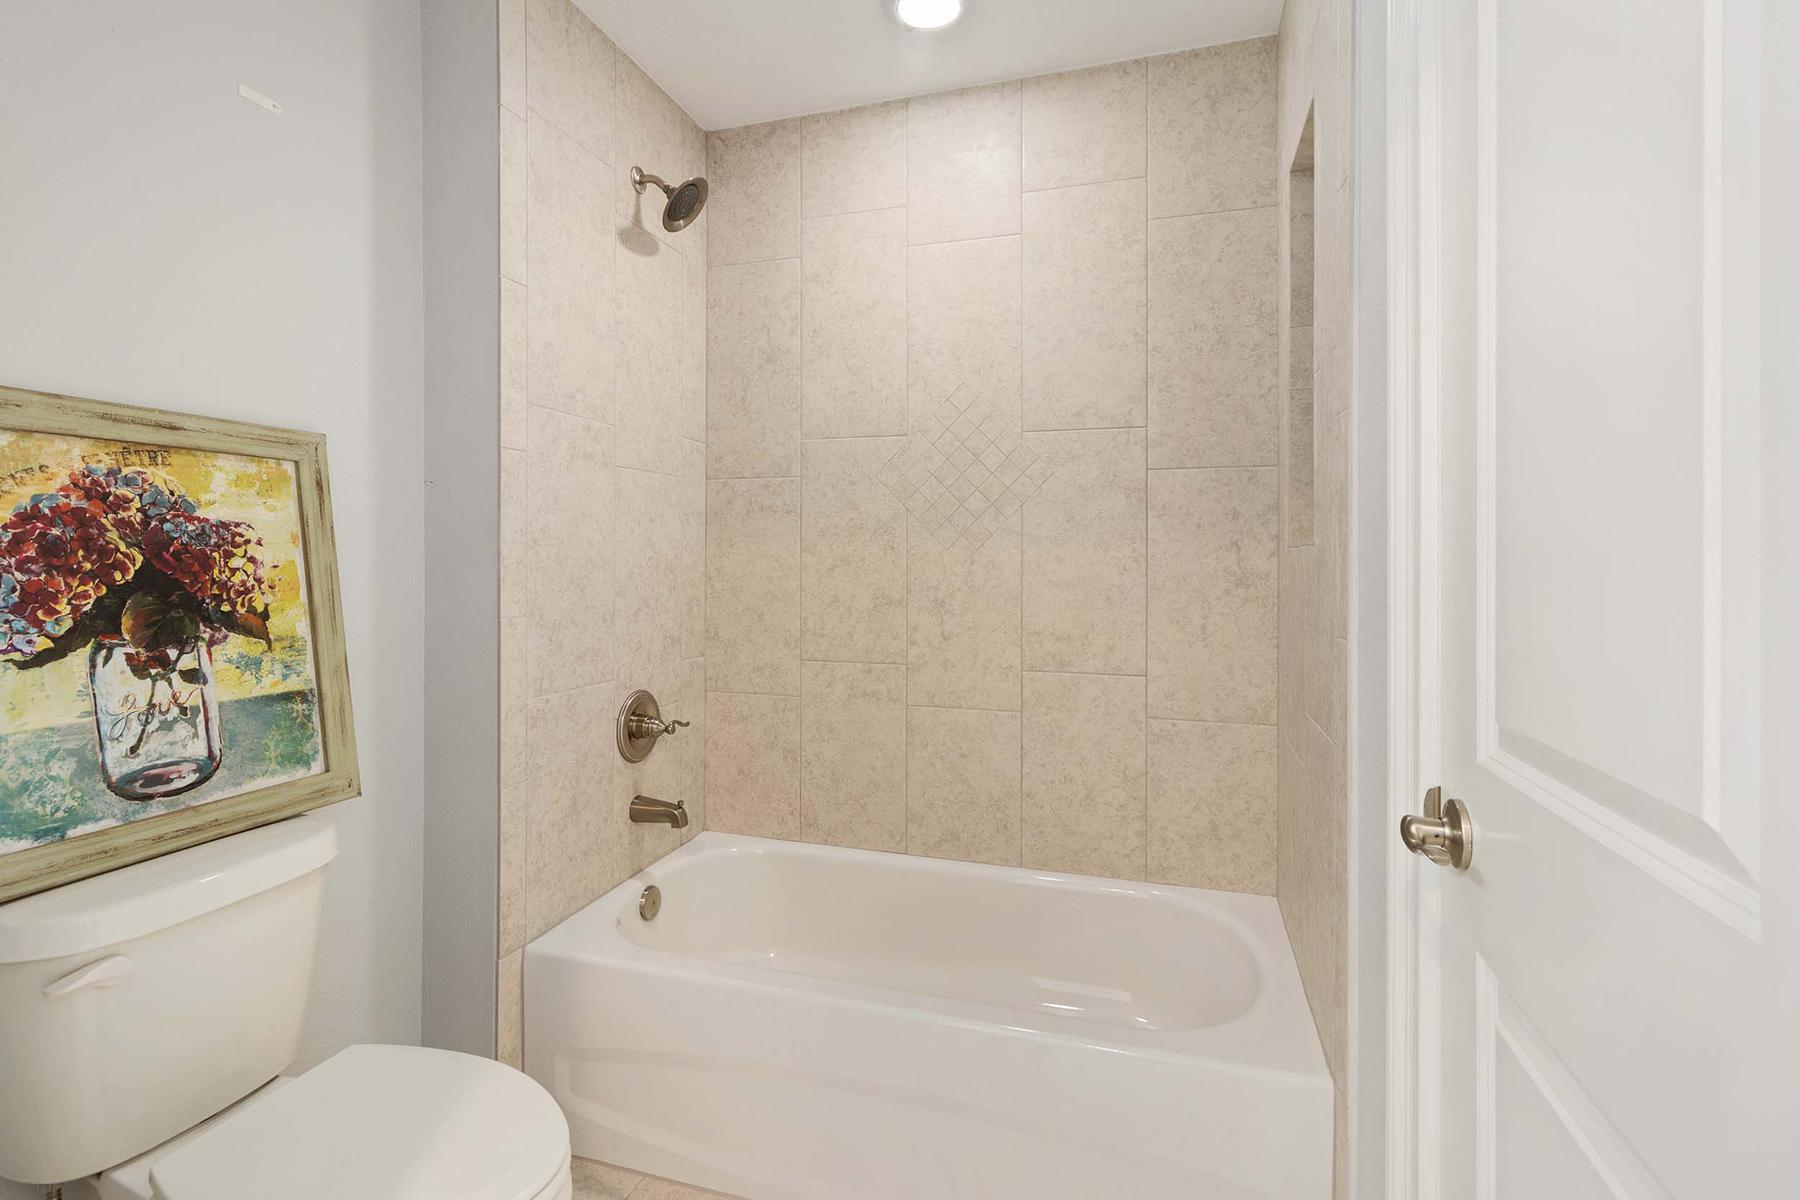 Additional photo for property listing at OCALA 728 Lake Diamond Ave, Ocala, Florida 34472 Estados Unidos